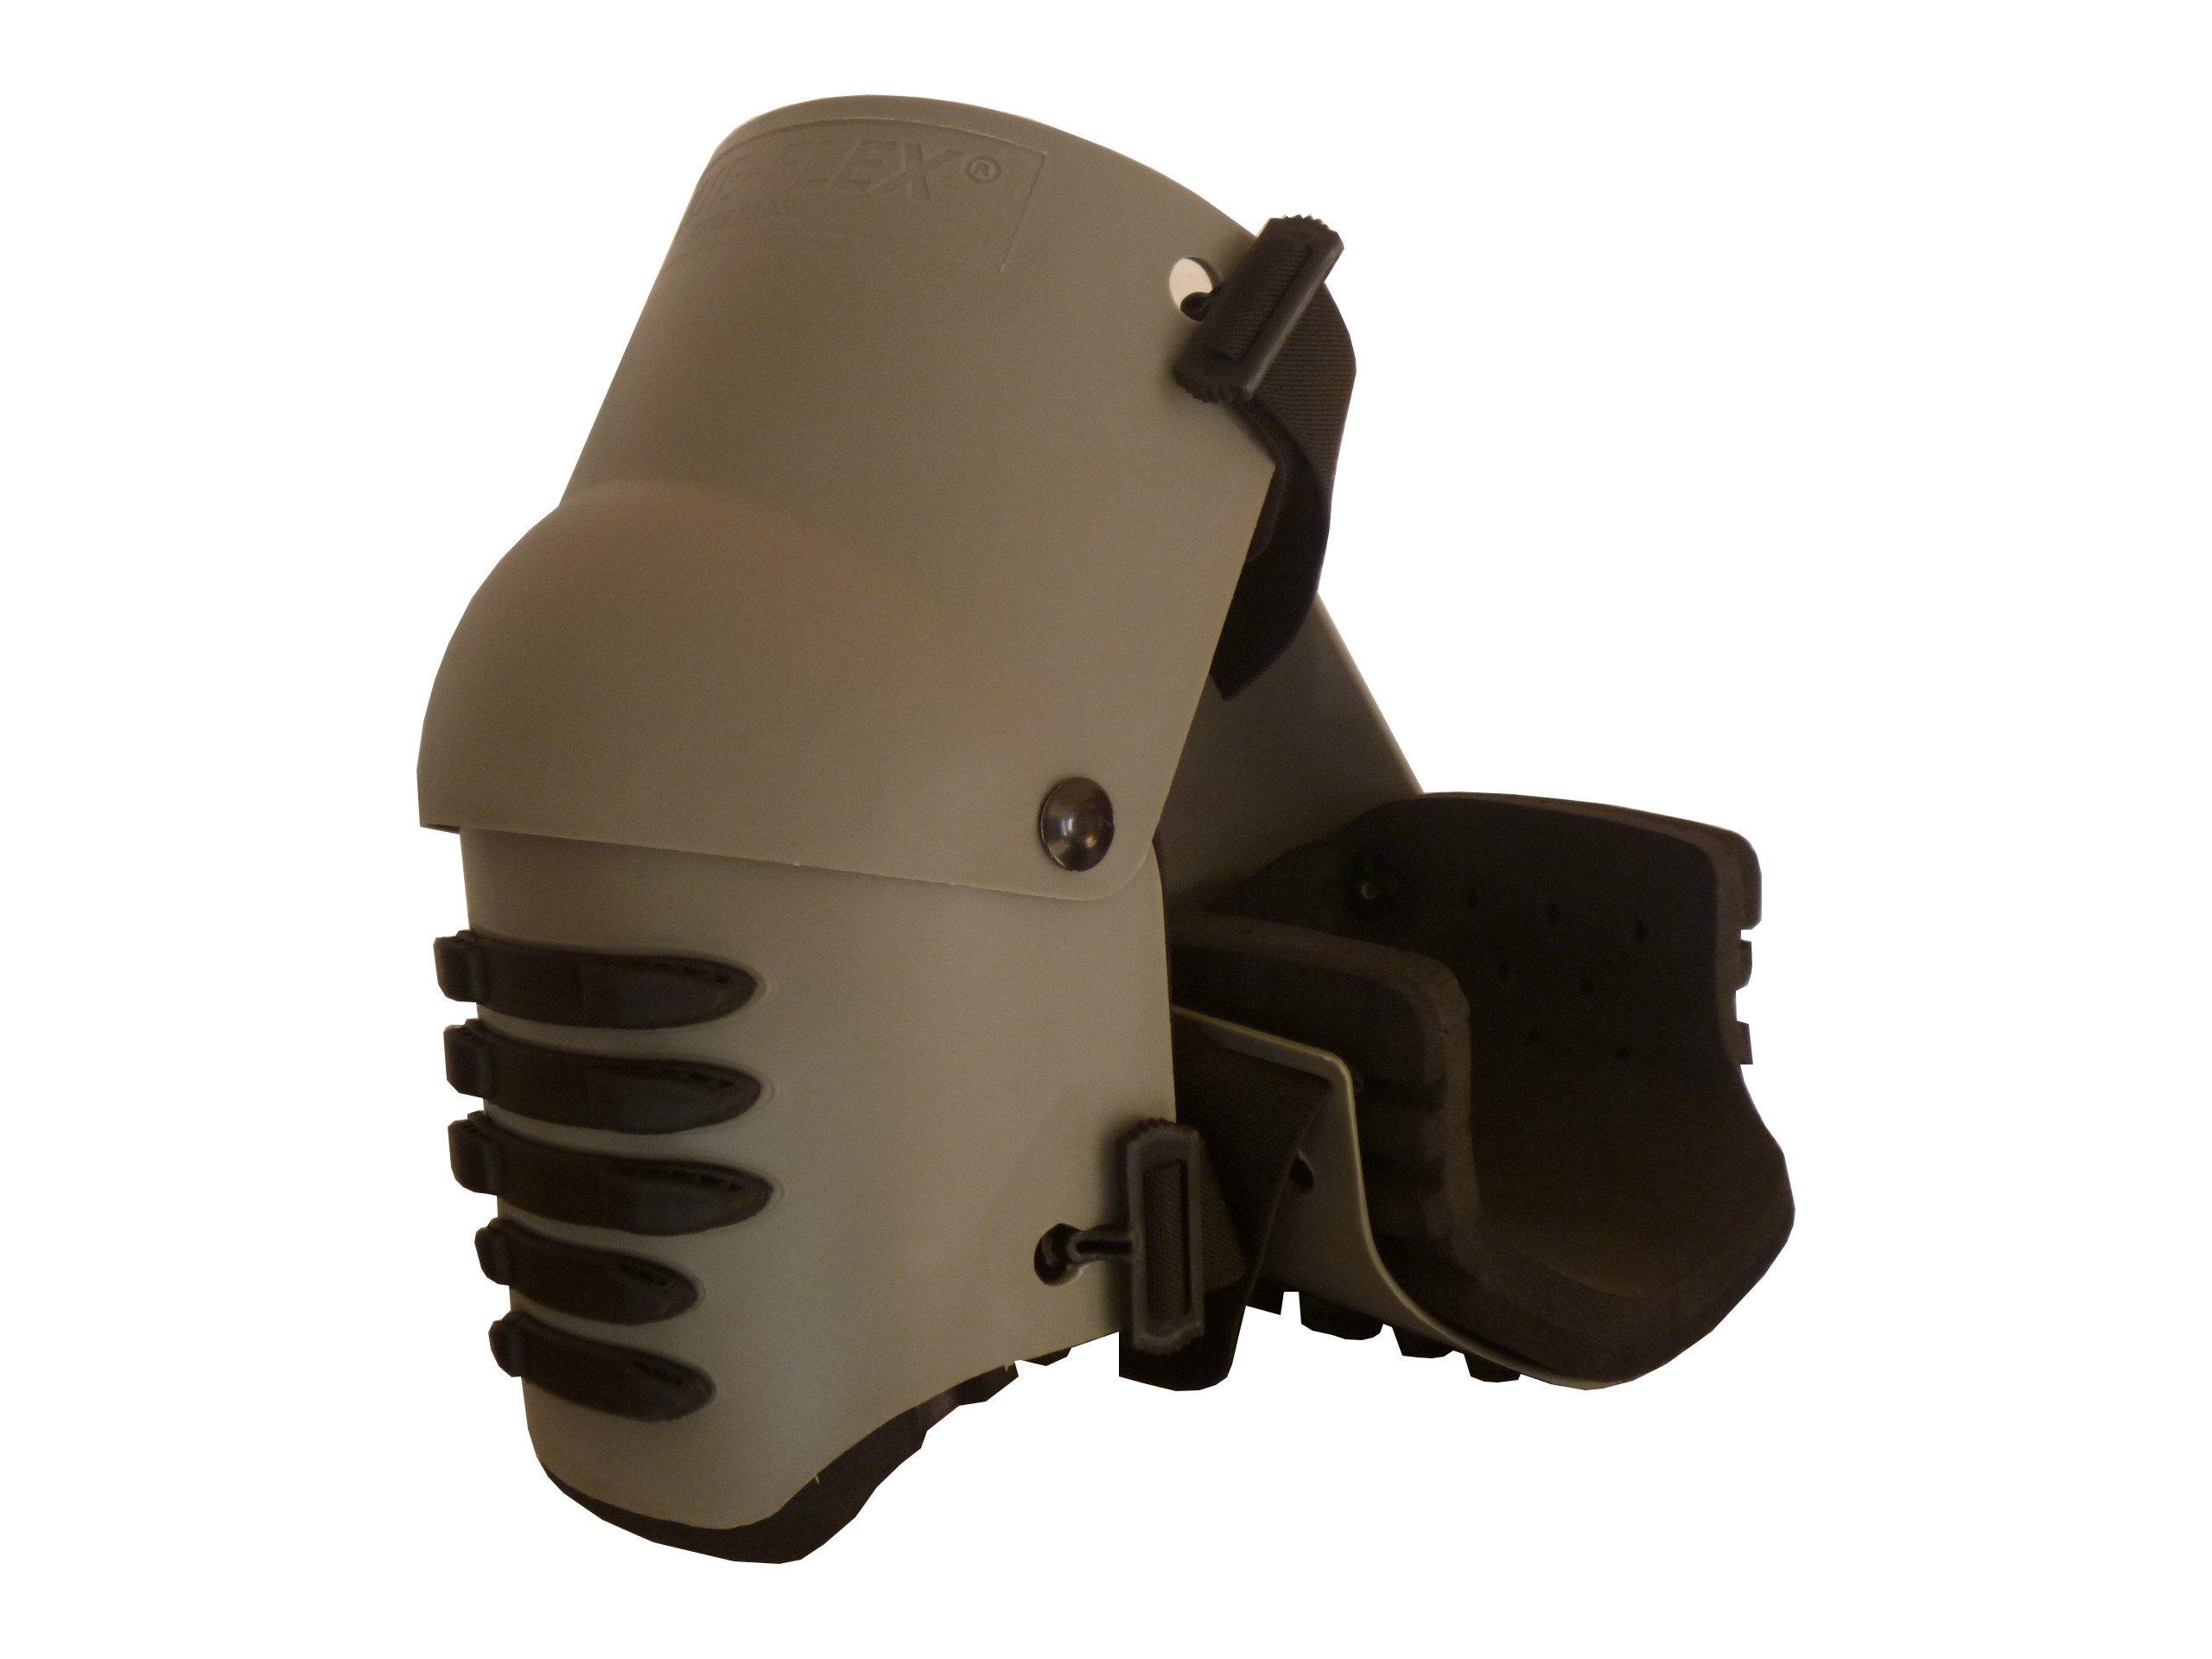 TSE Safety TSE-TFLX2.0 Knee Pad, One Size, Grey with Black Grip Strips